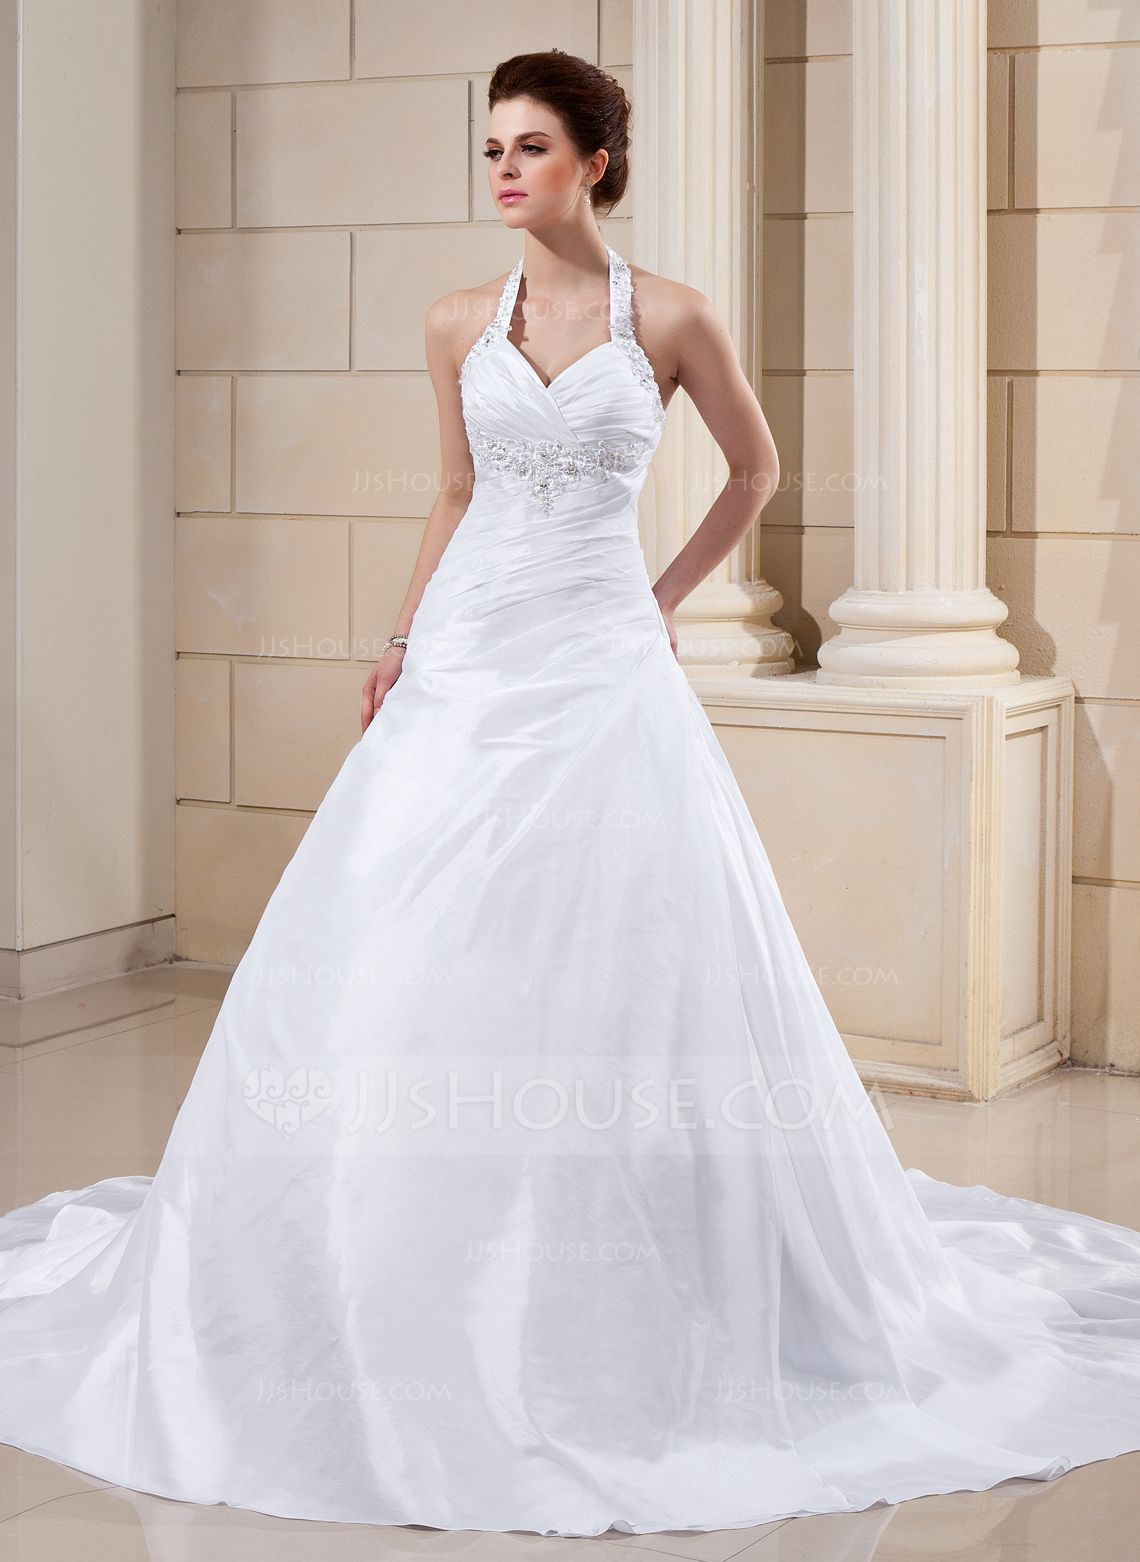 A Line Princess Halter Cathedral Train Taffeta Wedding Dress With